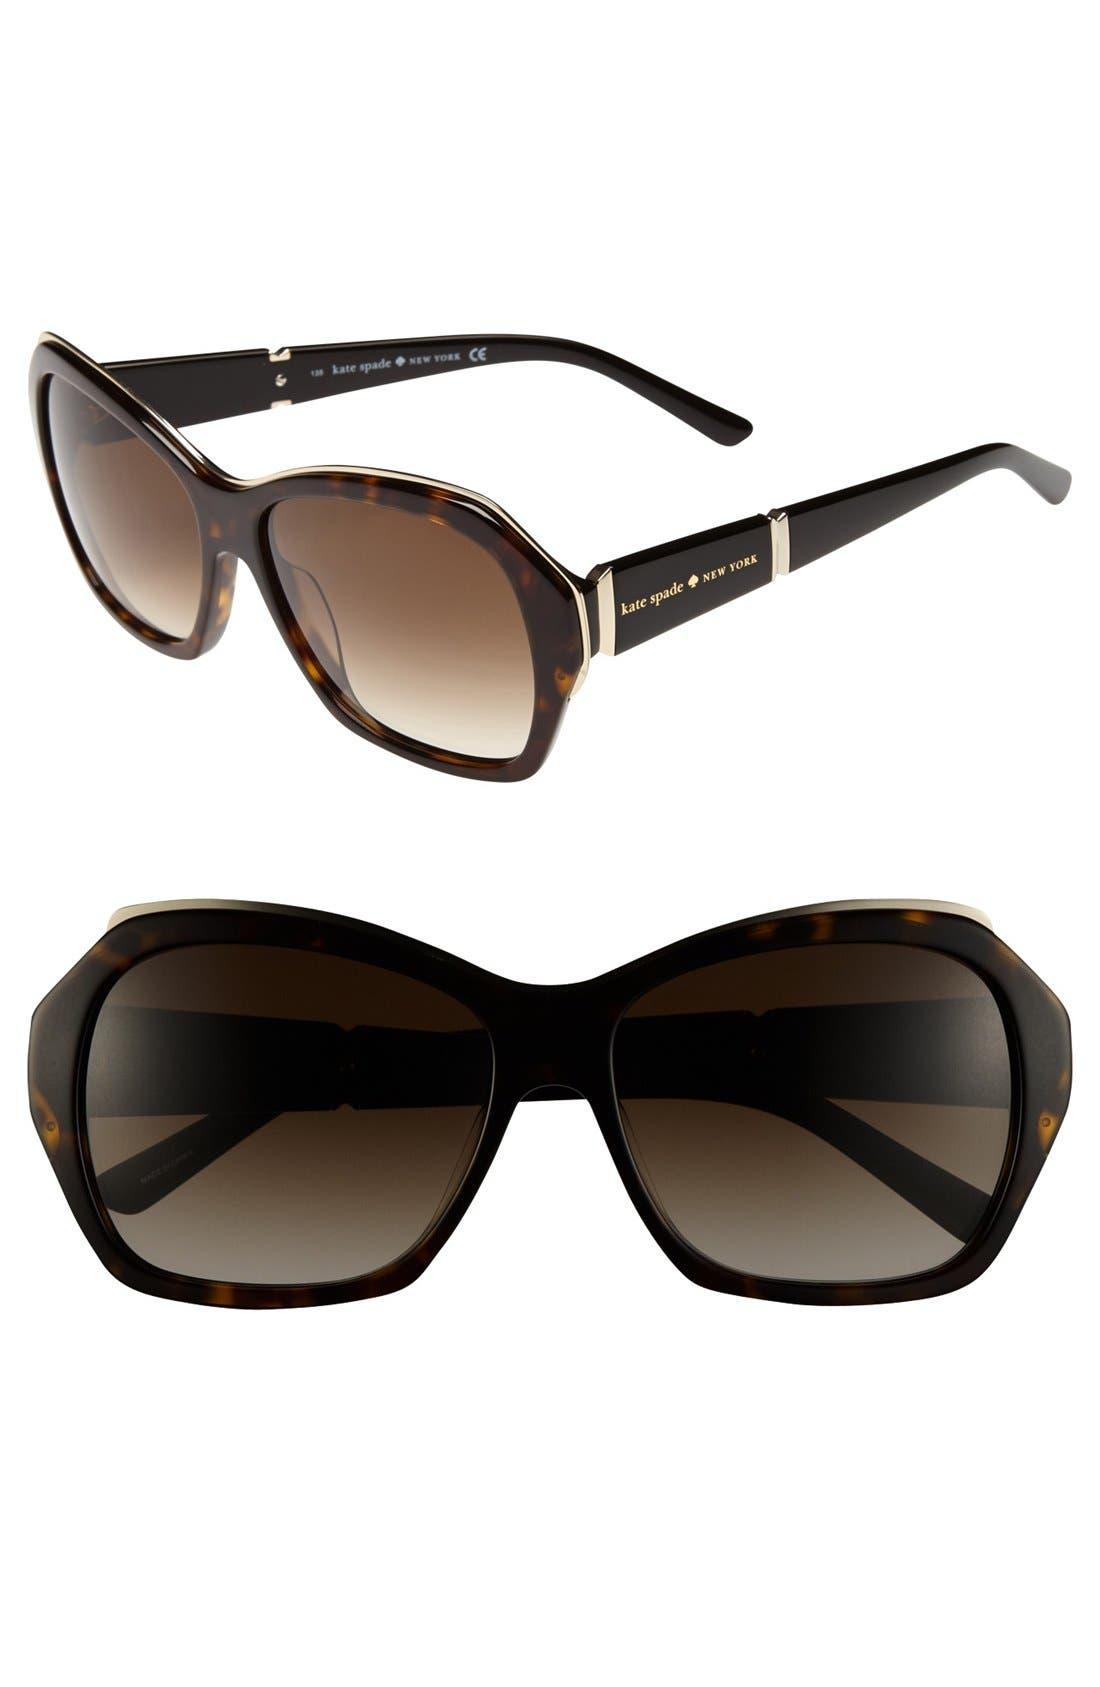 Alternate Image 1 Selected - kate spade new york 'gianna' 57mm oversized sunglasses